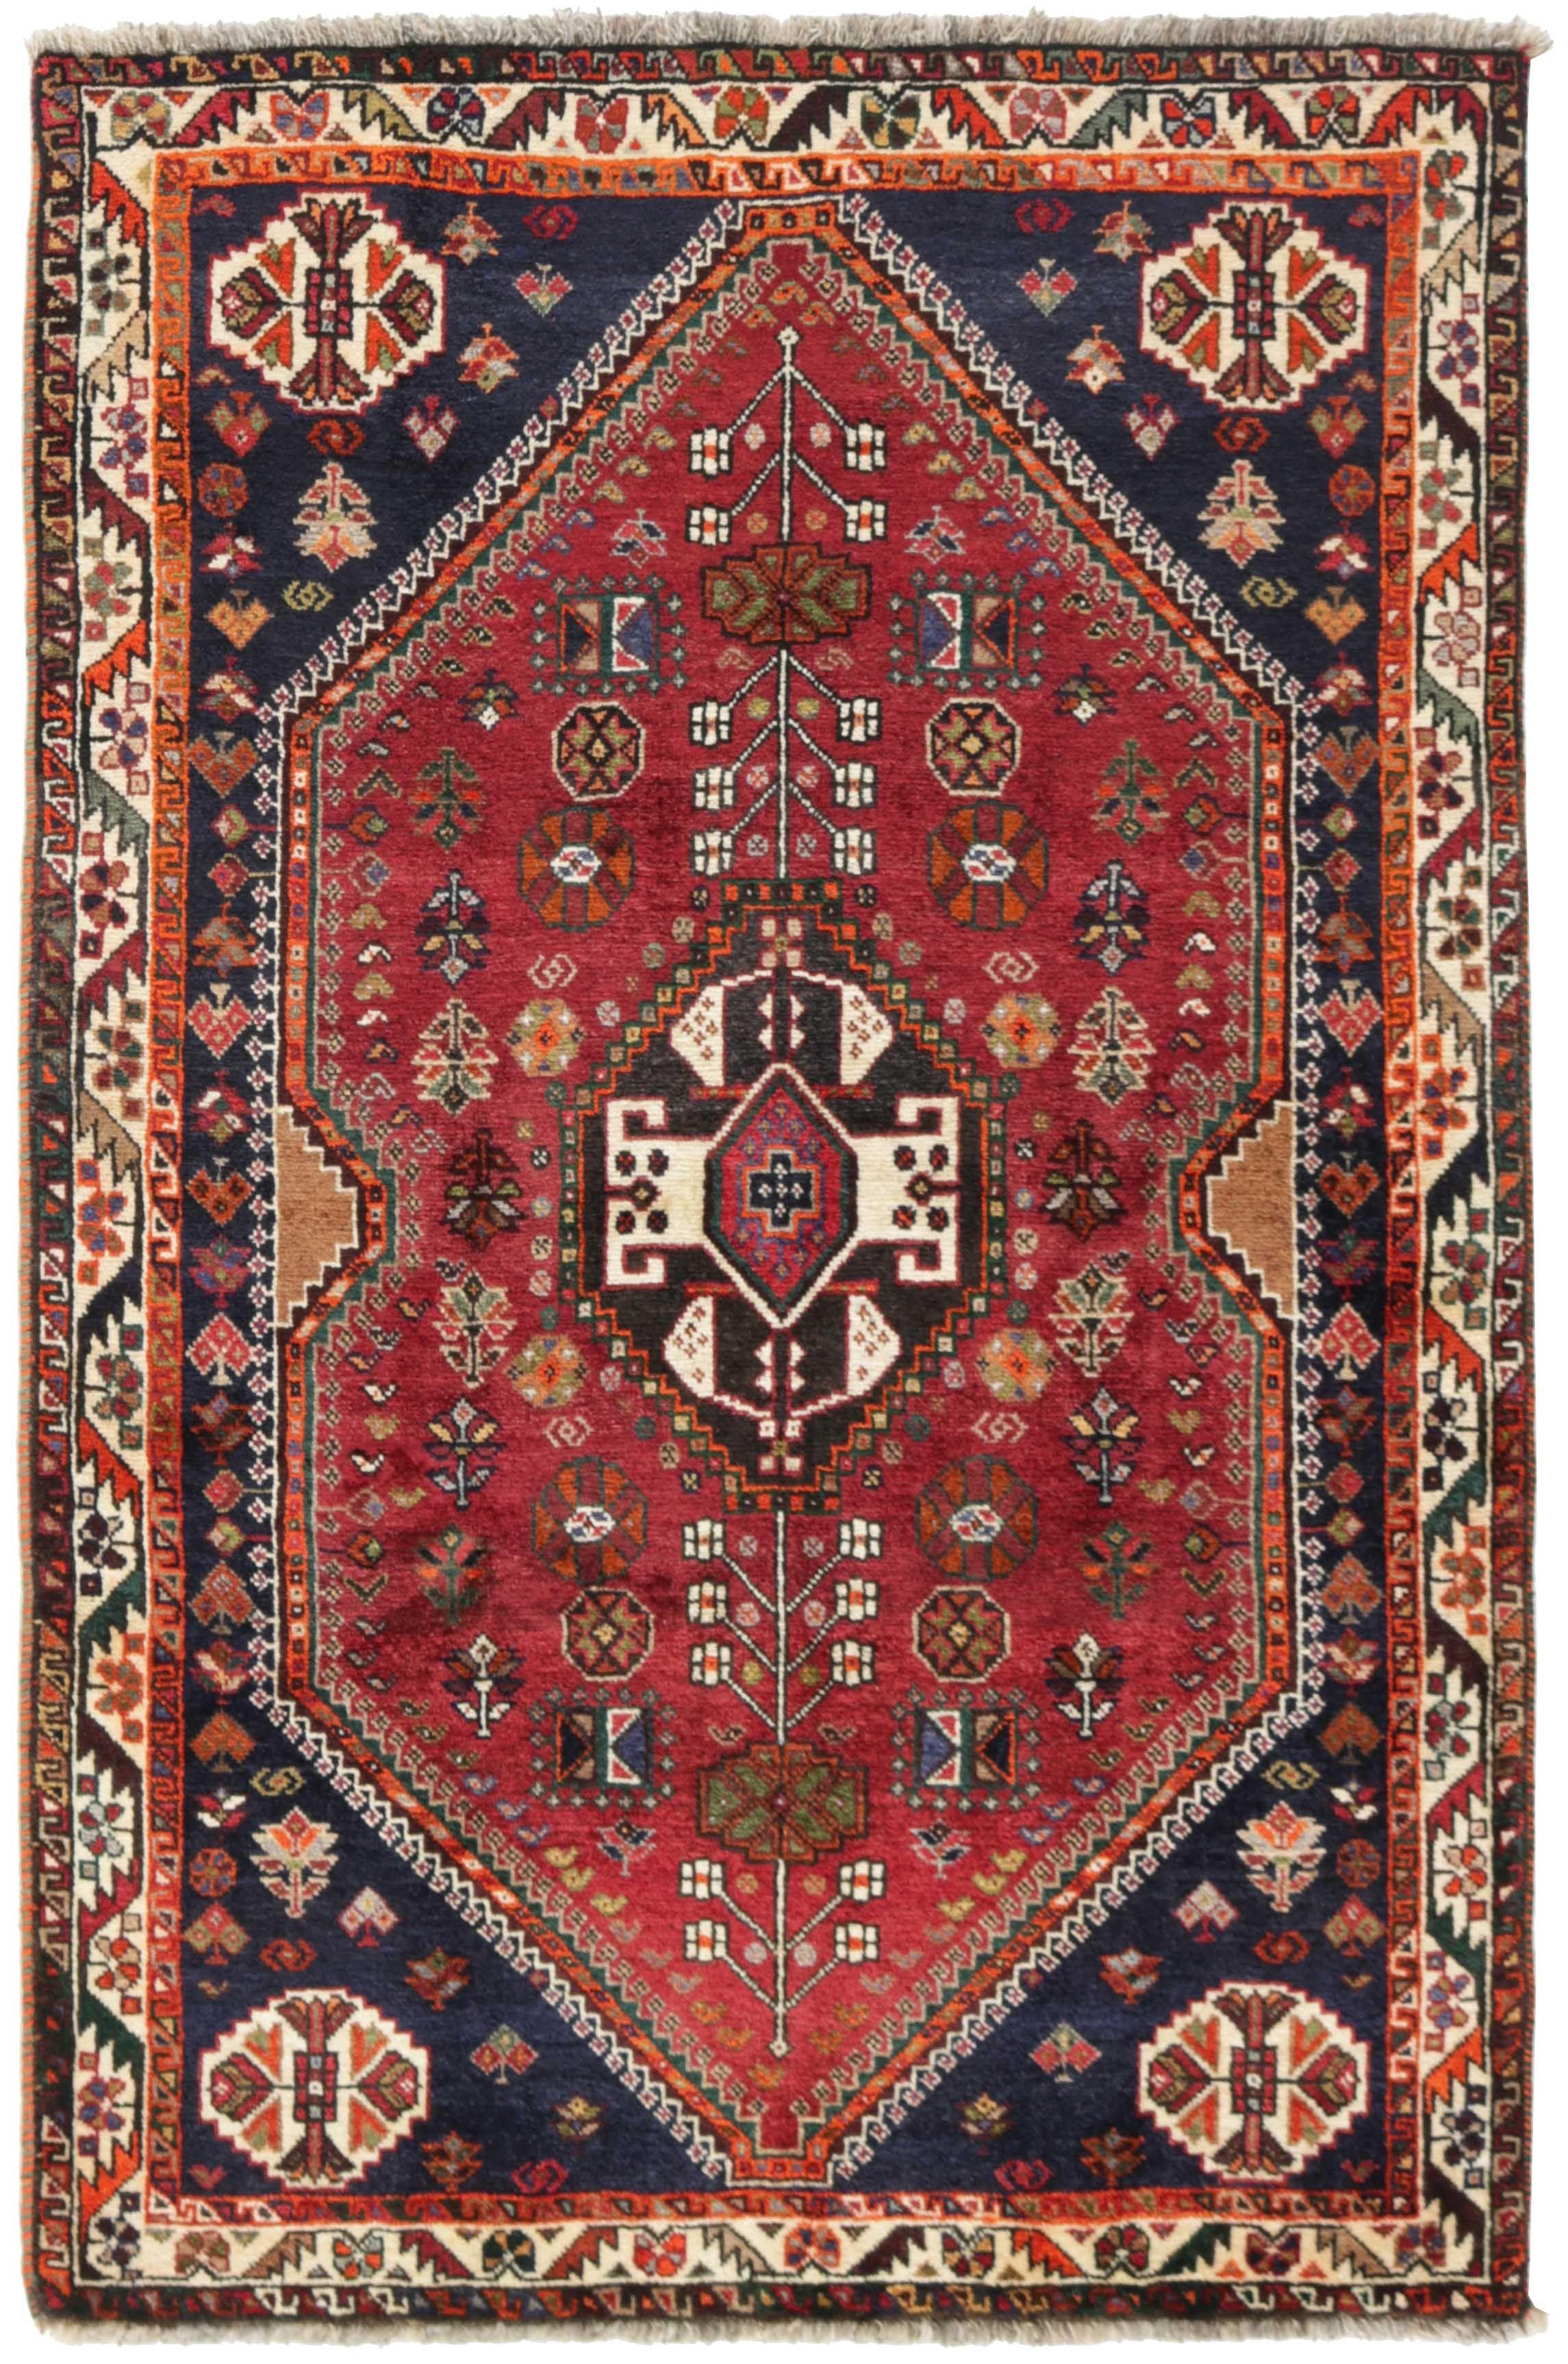 Kashghai Teppich 165x110 Oriental Carpets Carpet Handmade Rugs